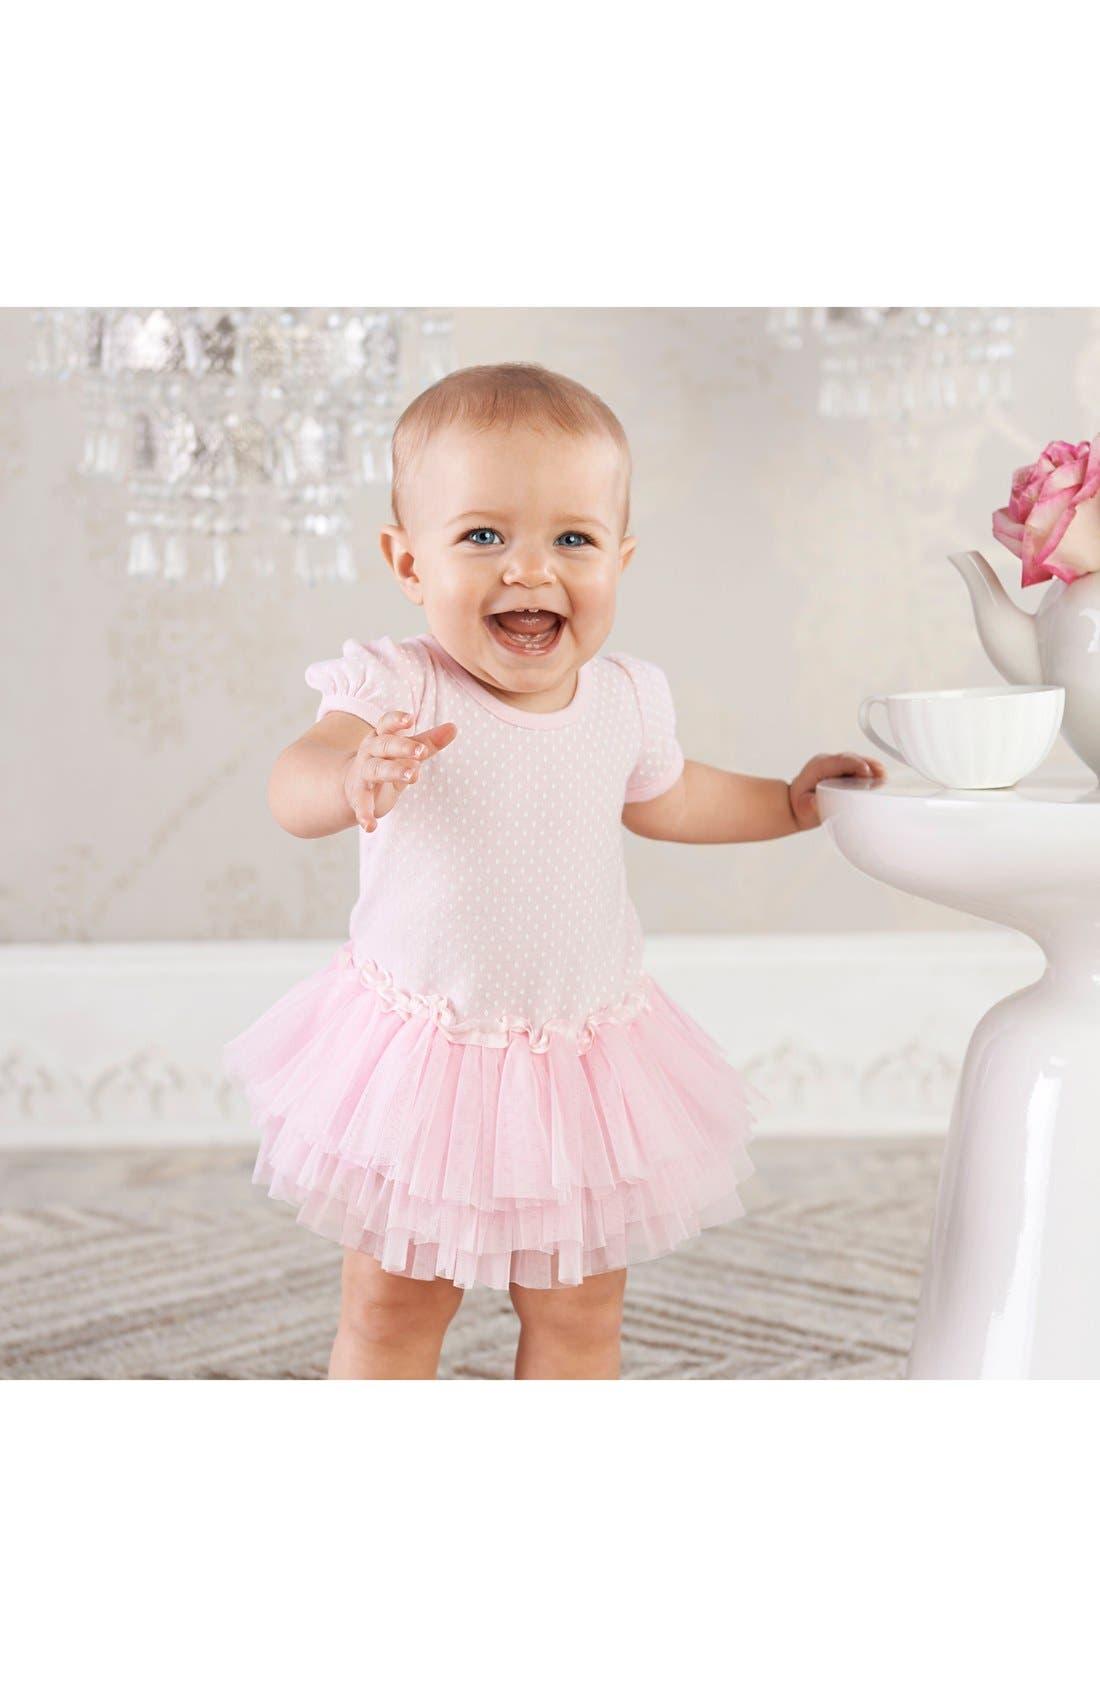 Little Princess 3-Piece Gift Set,                             Alternate thumbnail 3, color,                             Pink